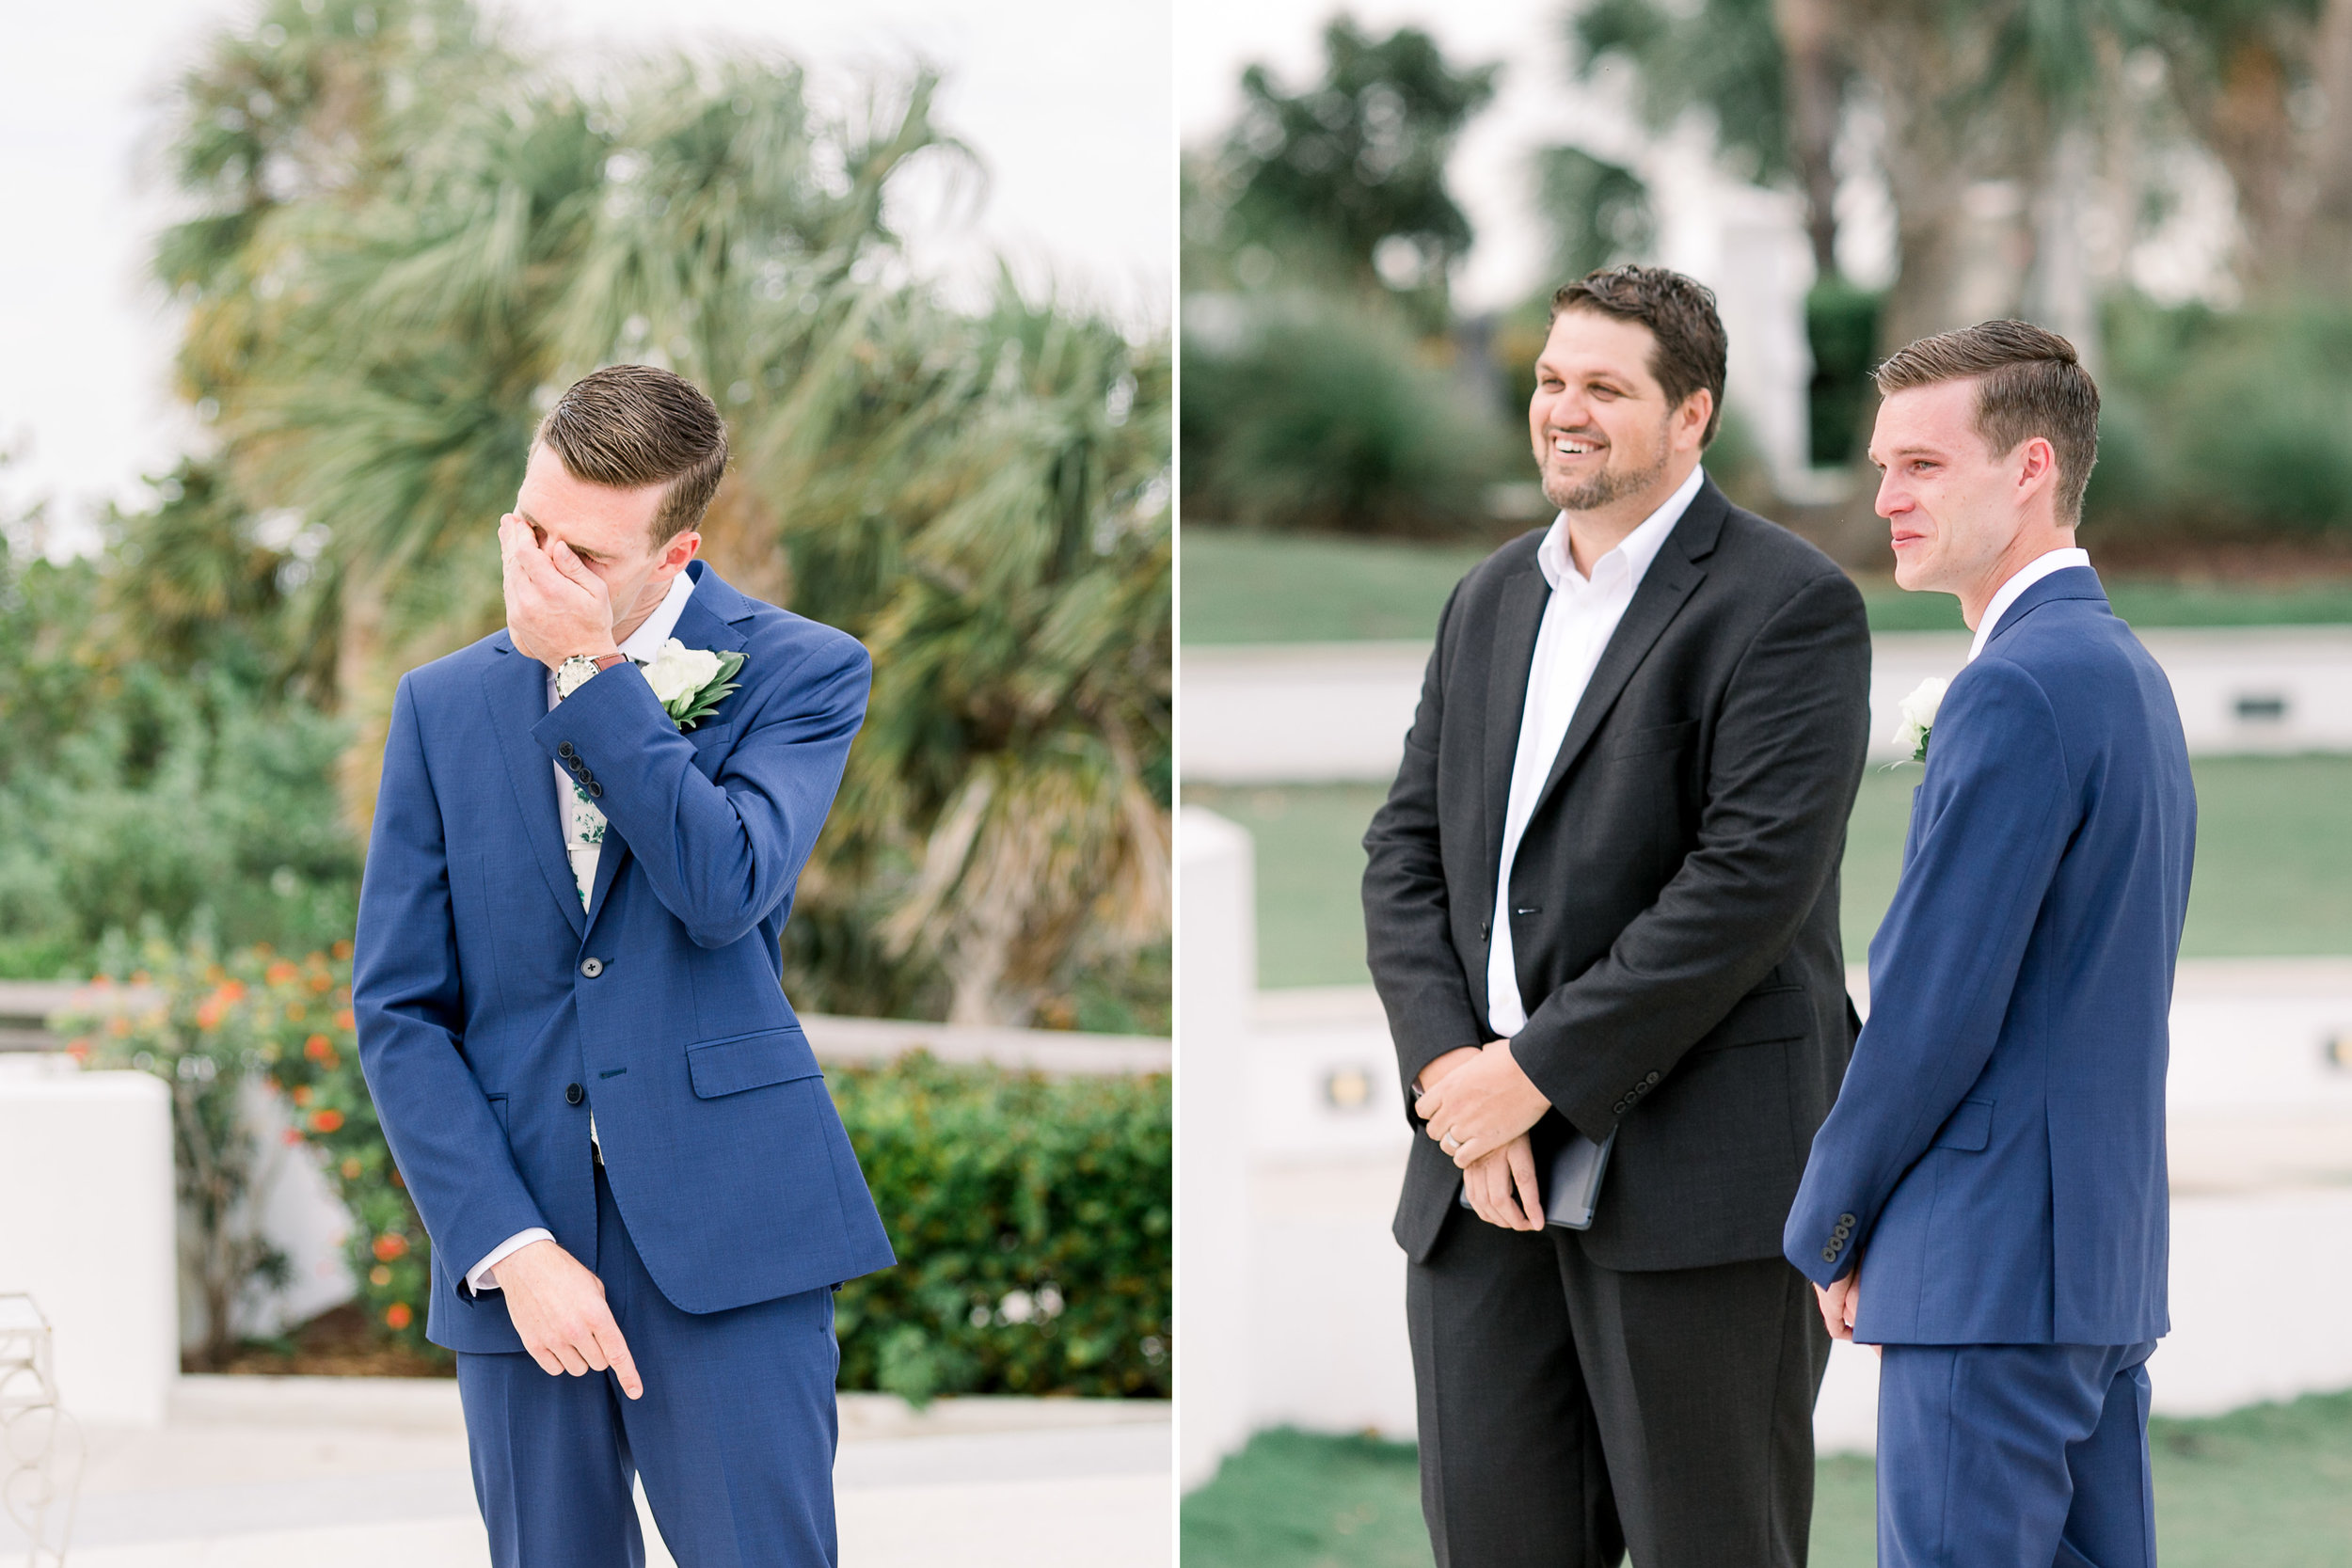 weddingphotographyverobeach.jpg